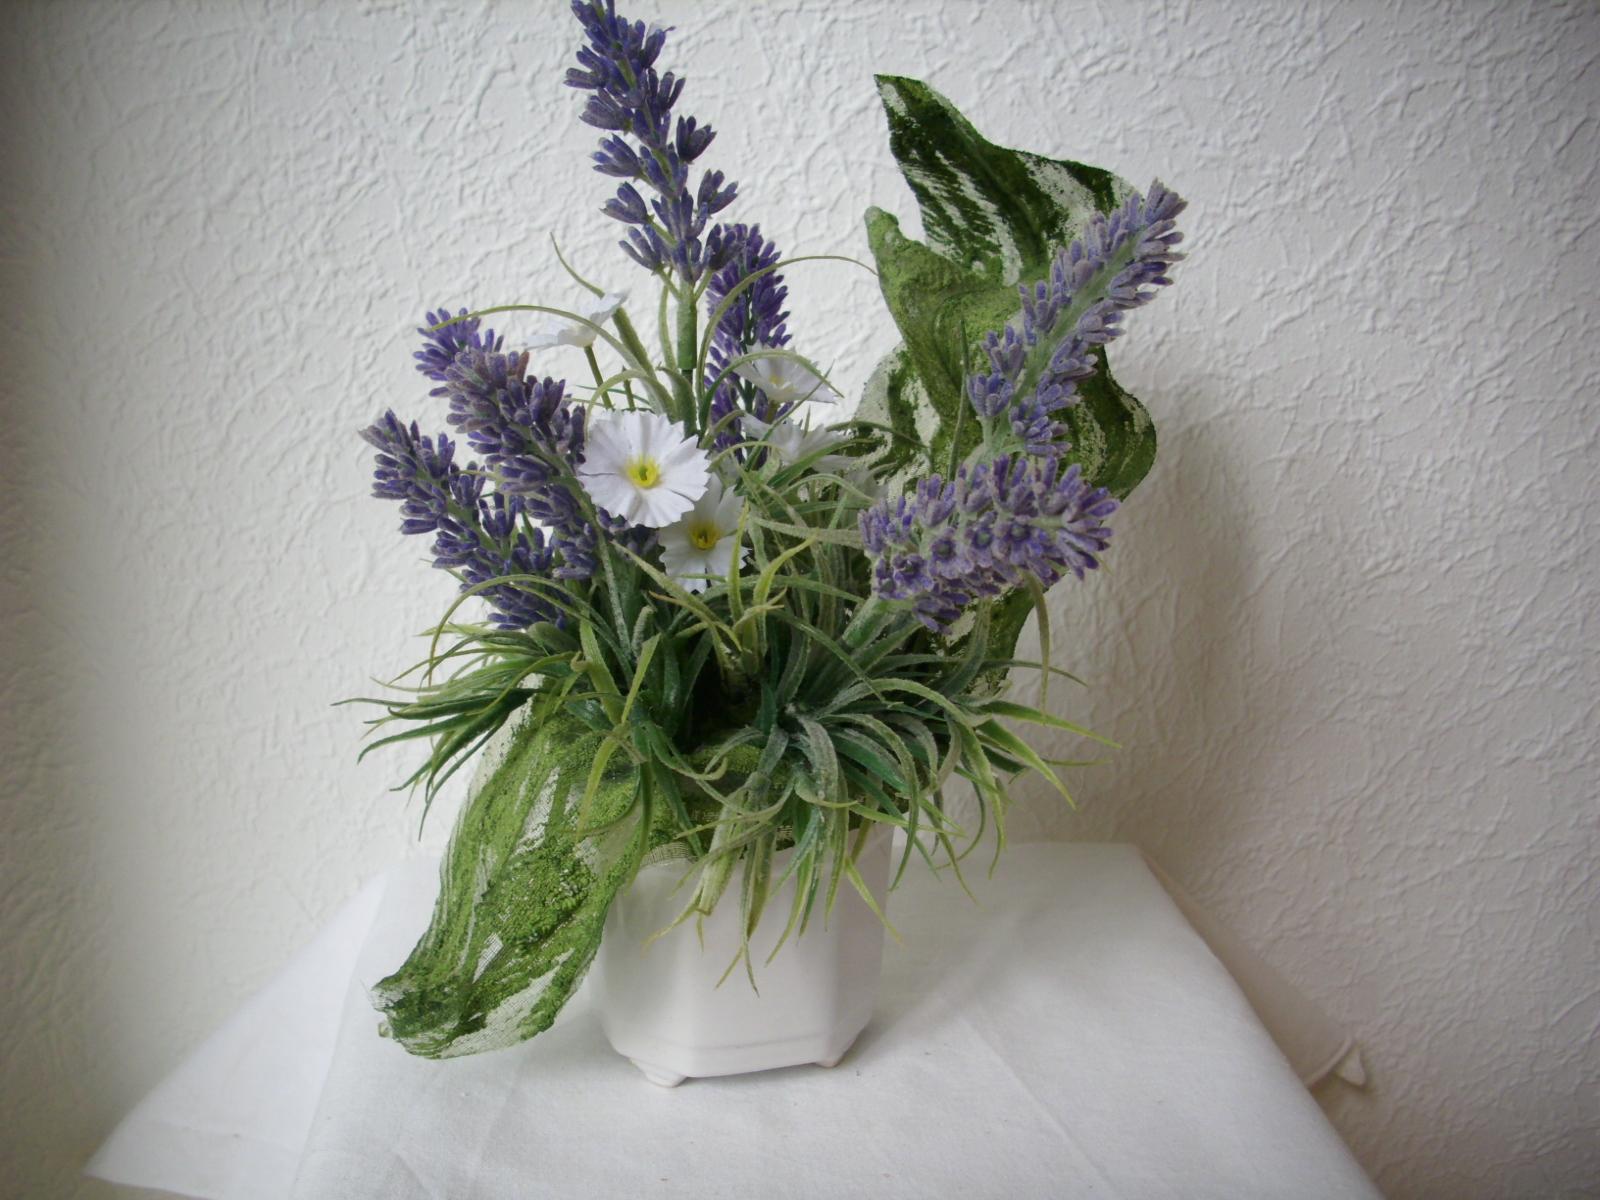 blumengesteck tischgesteck im topf lavendel blau weiss. Black Bedroom Furniture Sets. Home Design Ideas